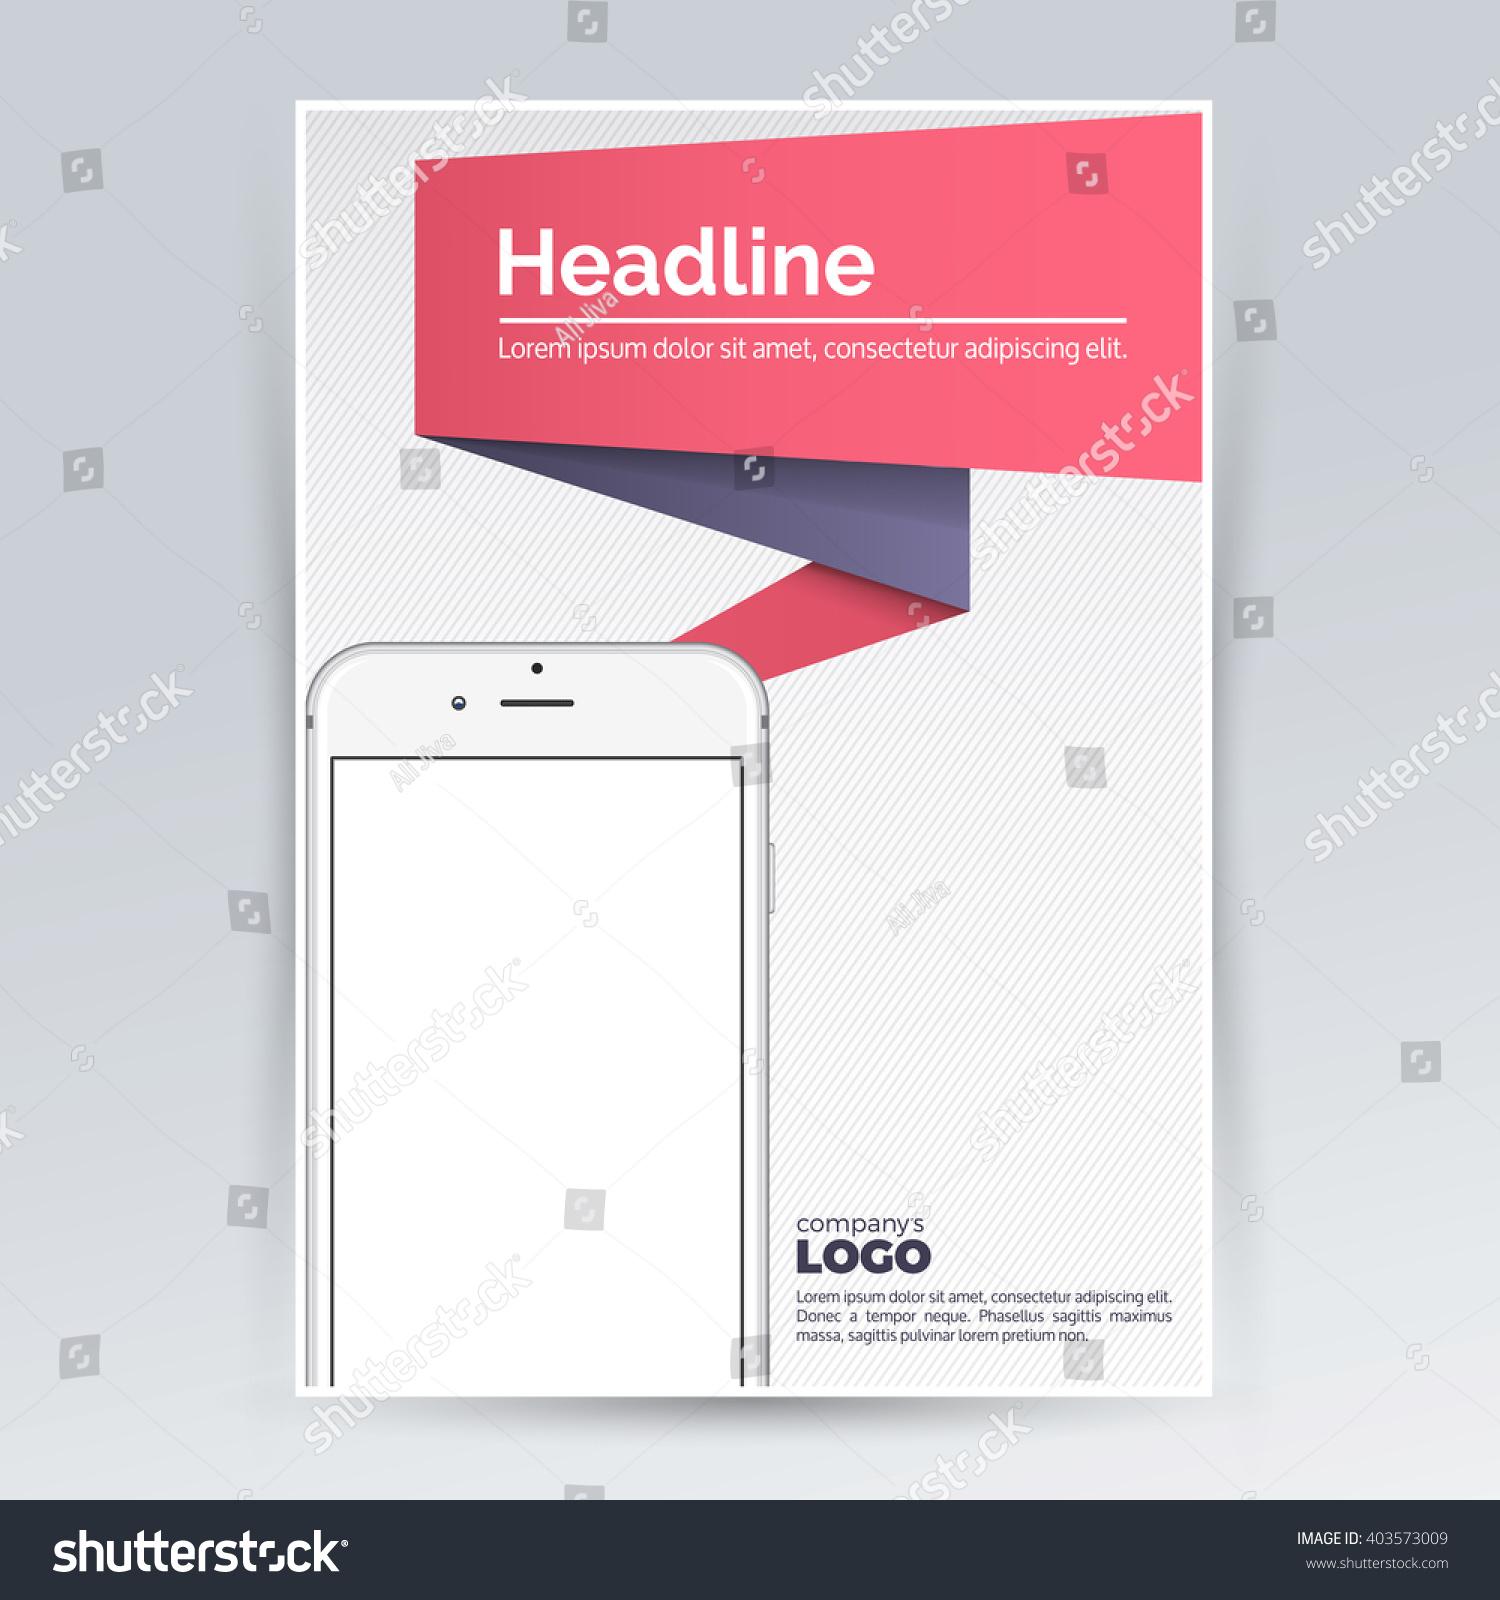 Advertising Design Template